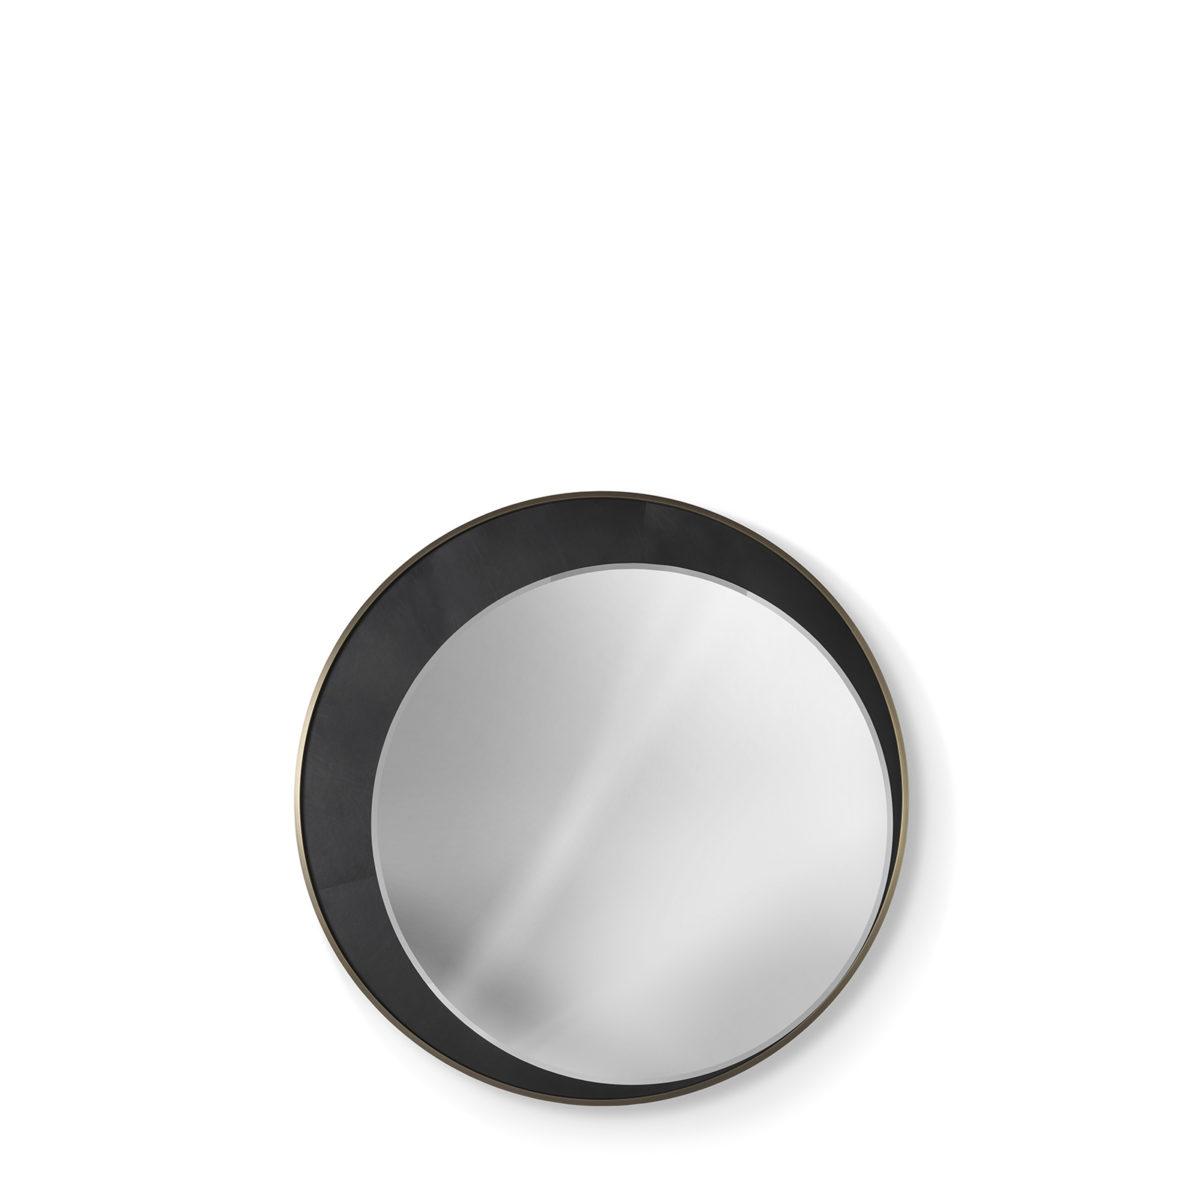 Gianfranco Ferre Home Carroll Mirror 01